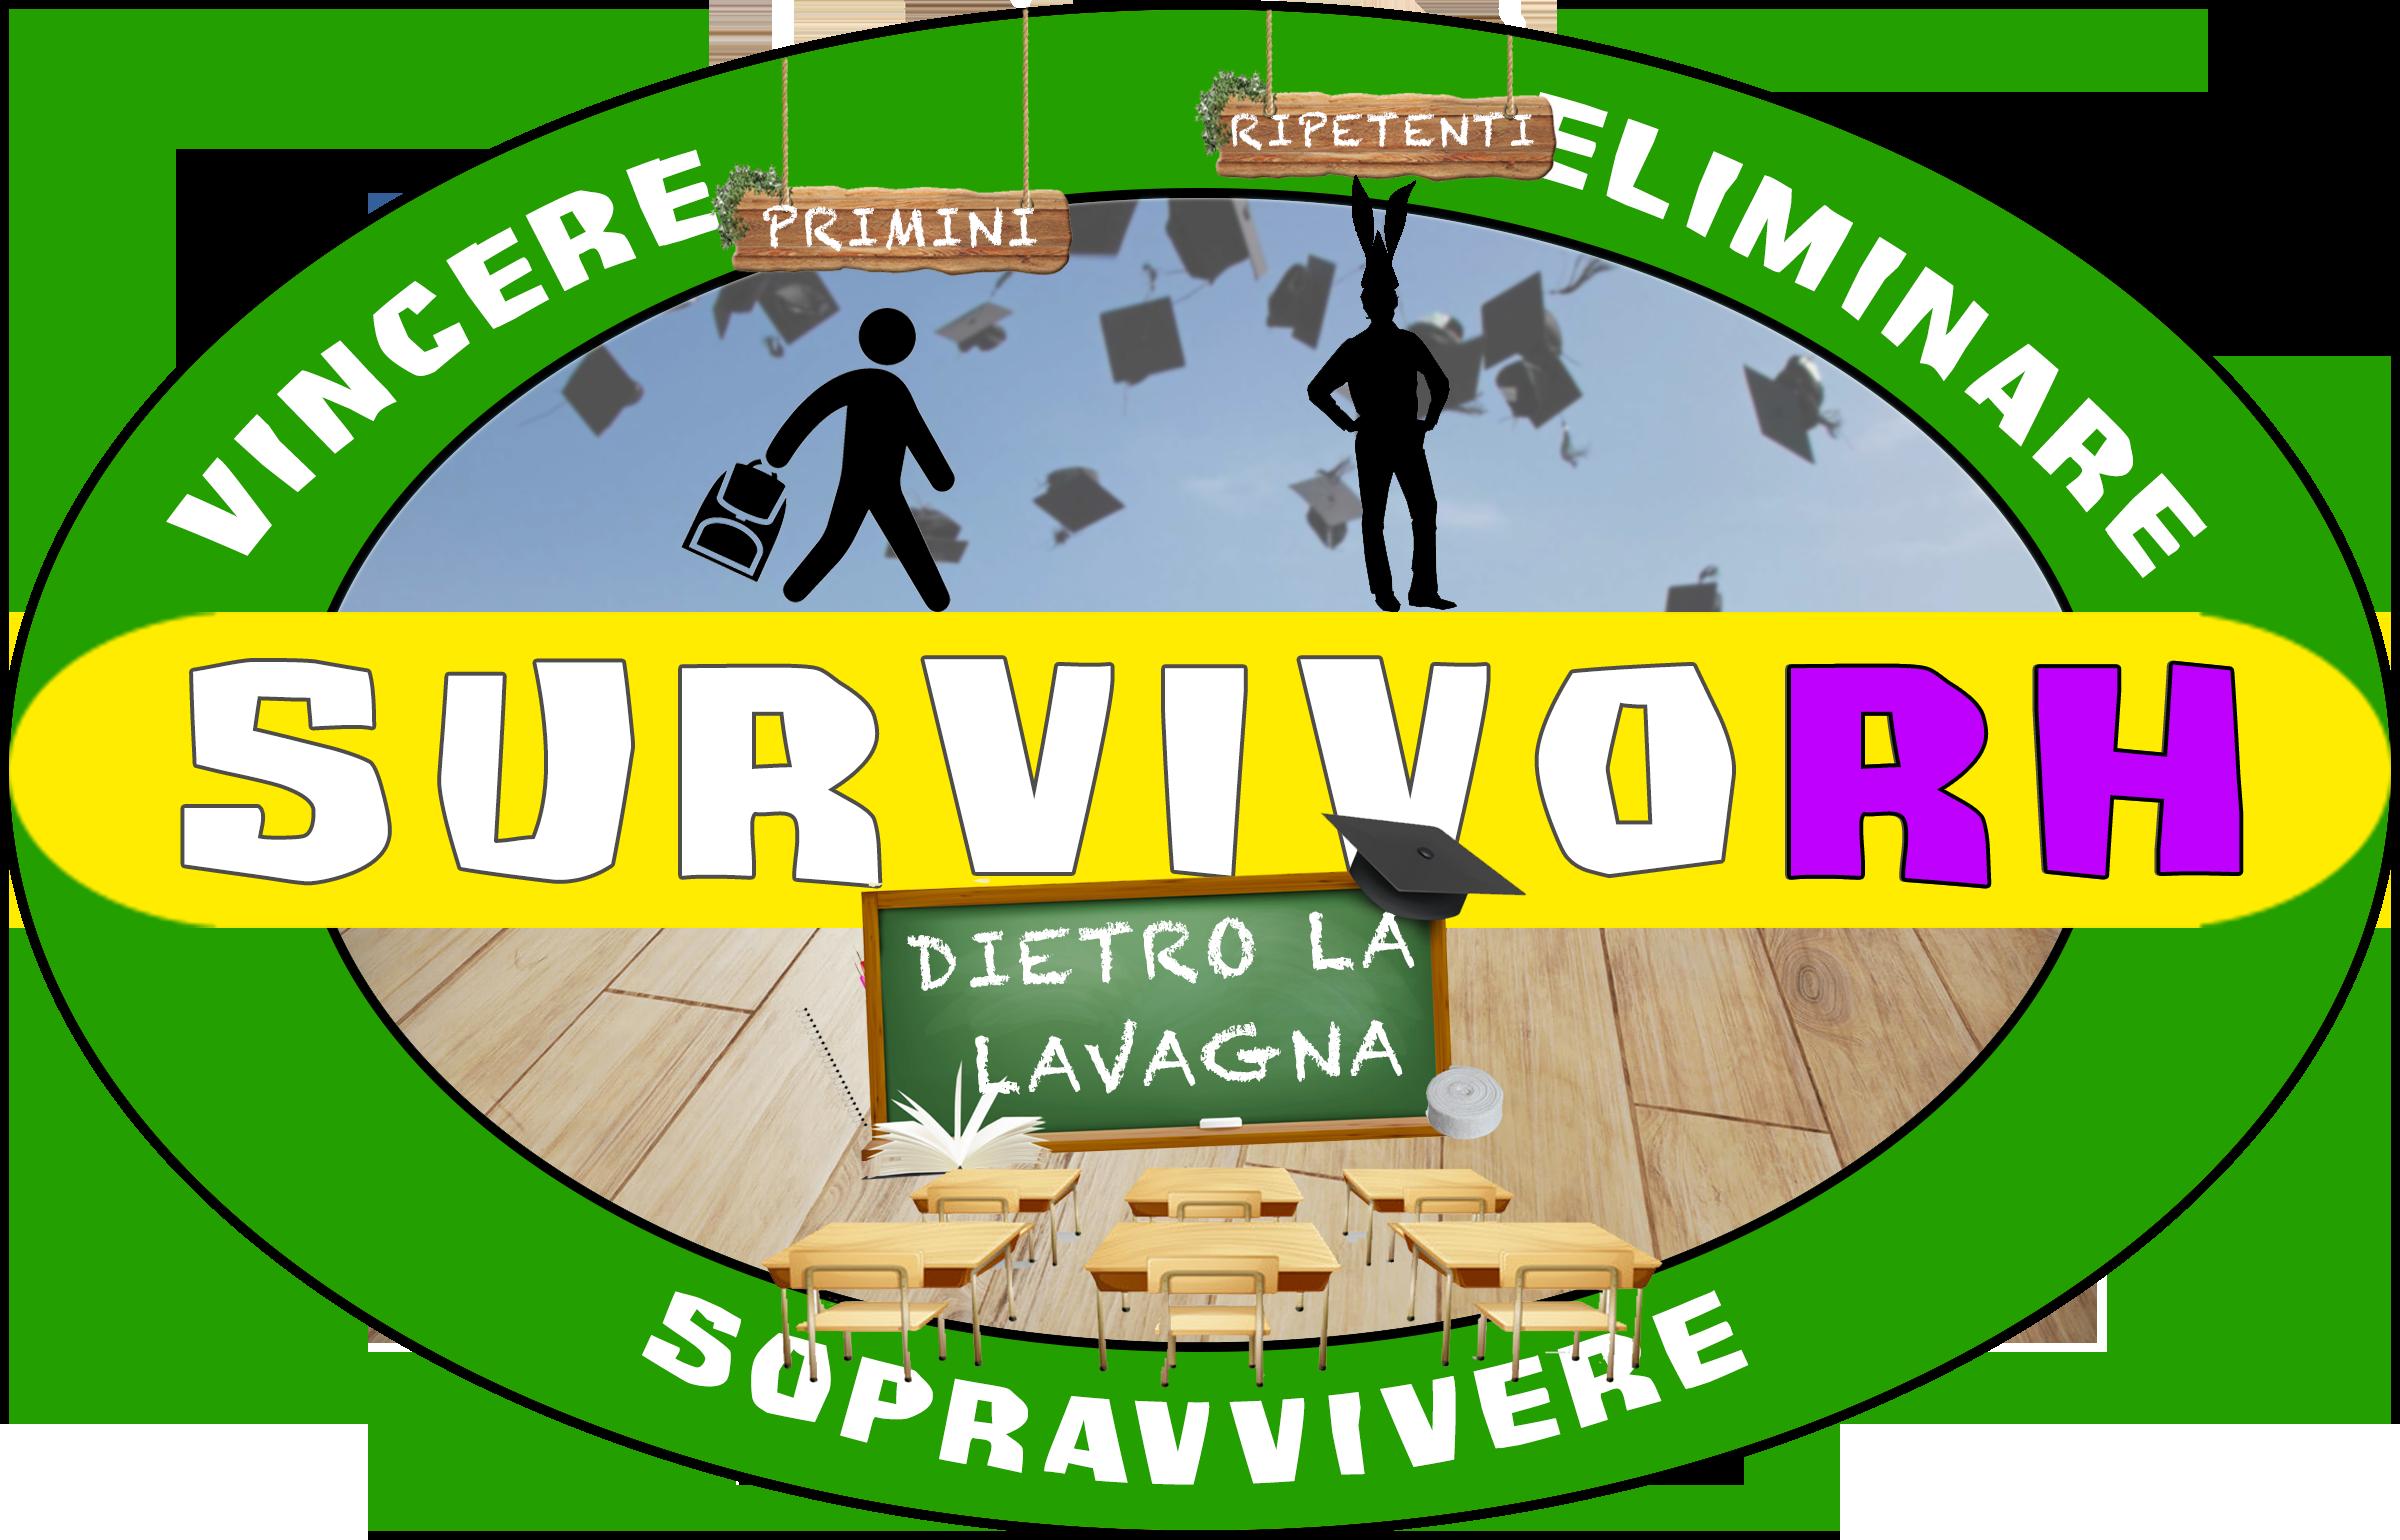 SurvivoRH%2525204%252520logo.png